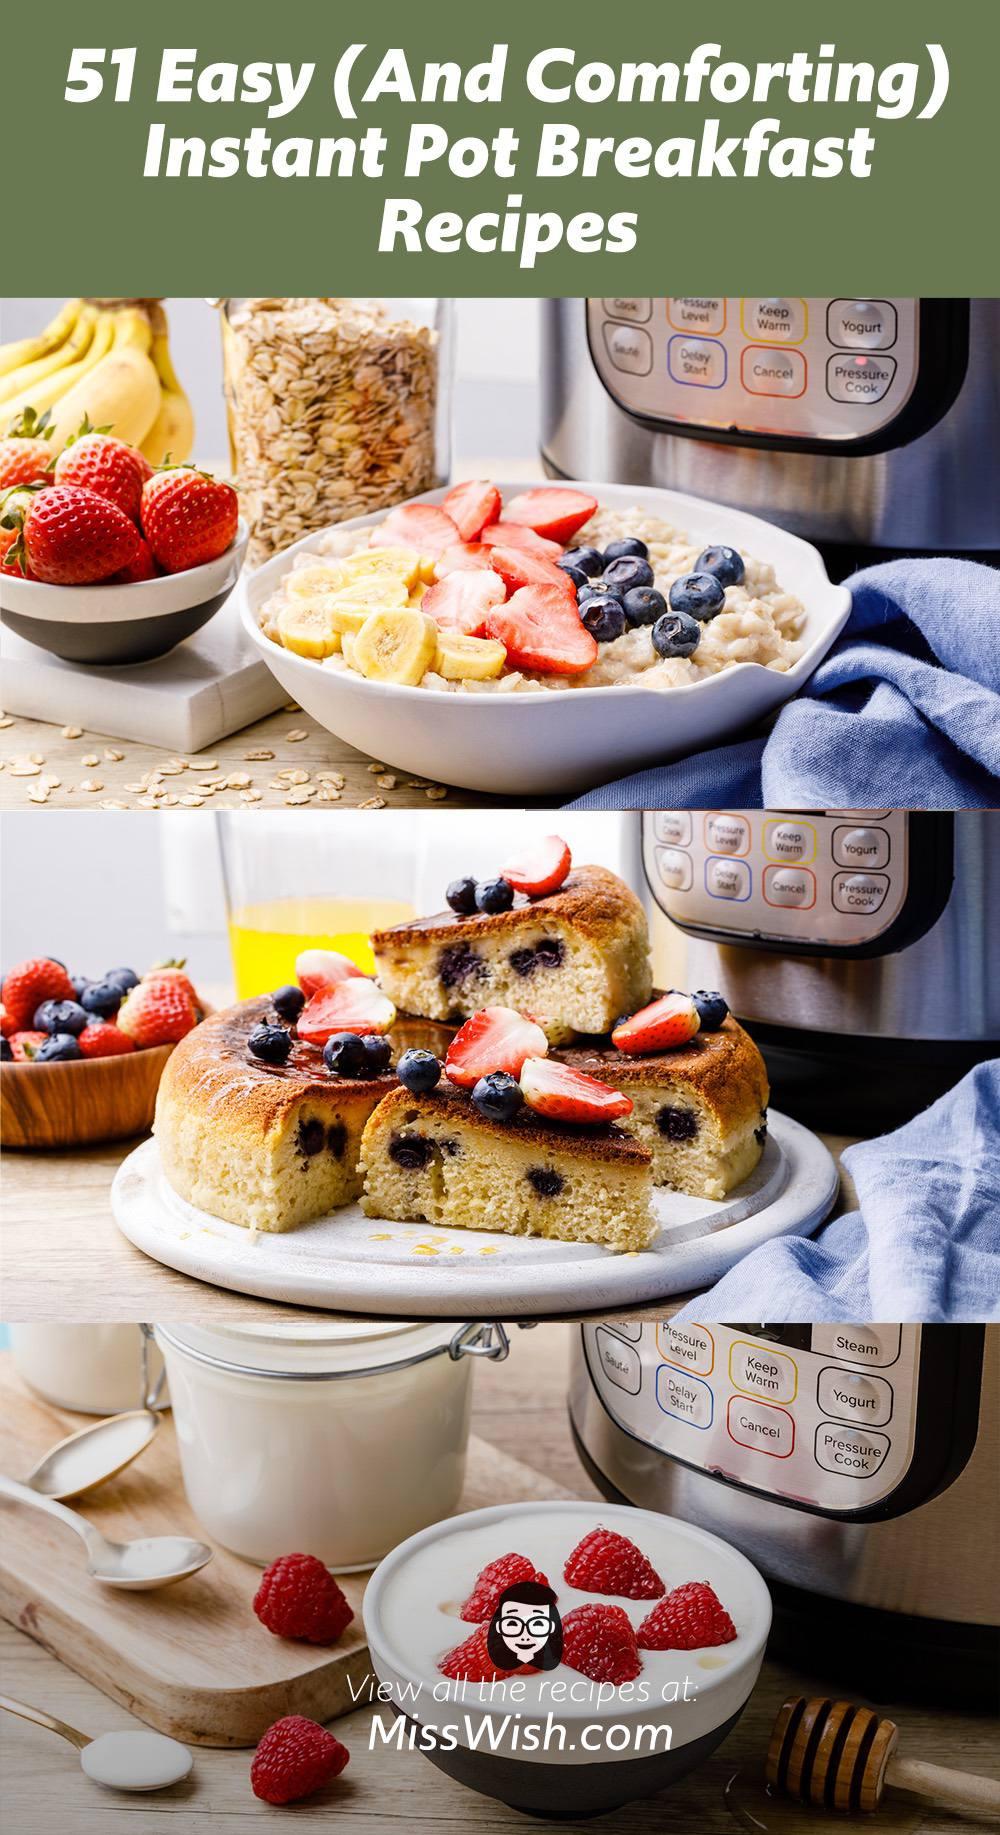 51 Easy Instant Pot Breakfast Recipes